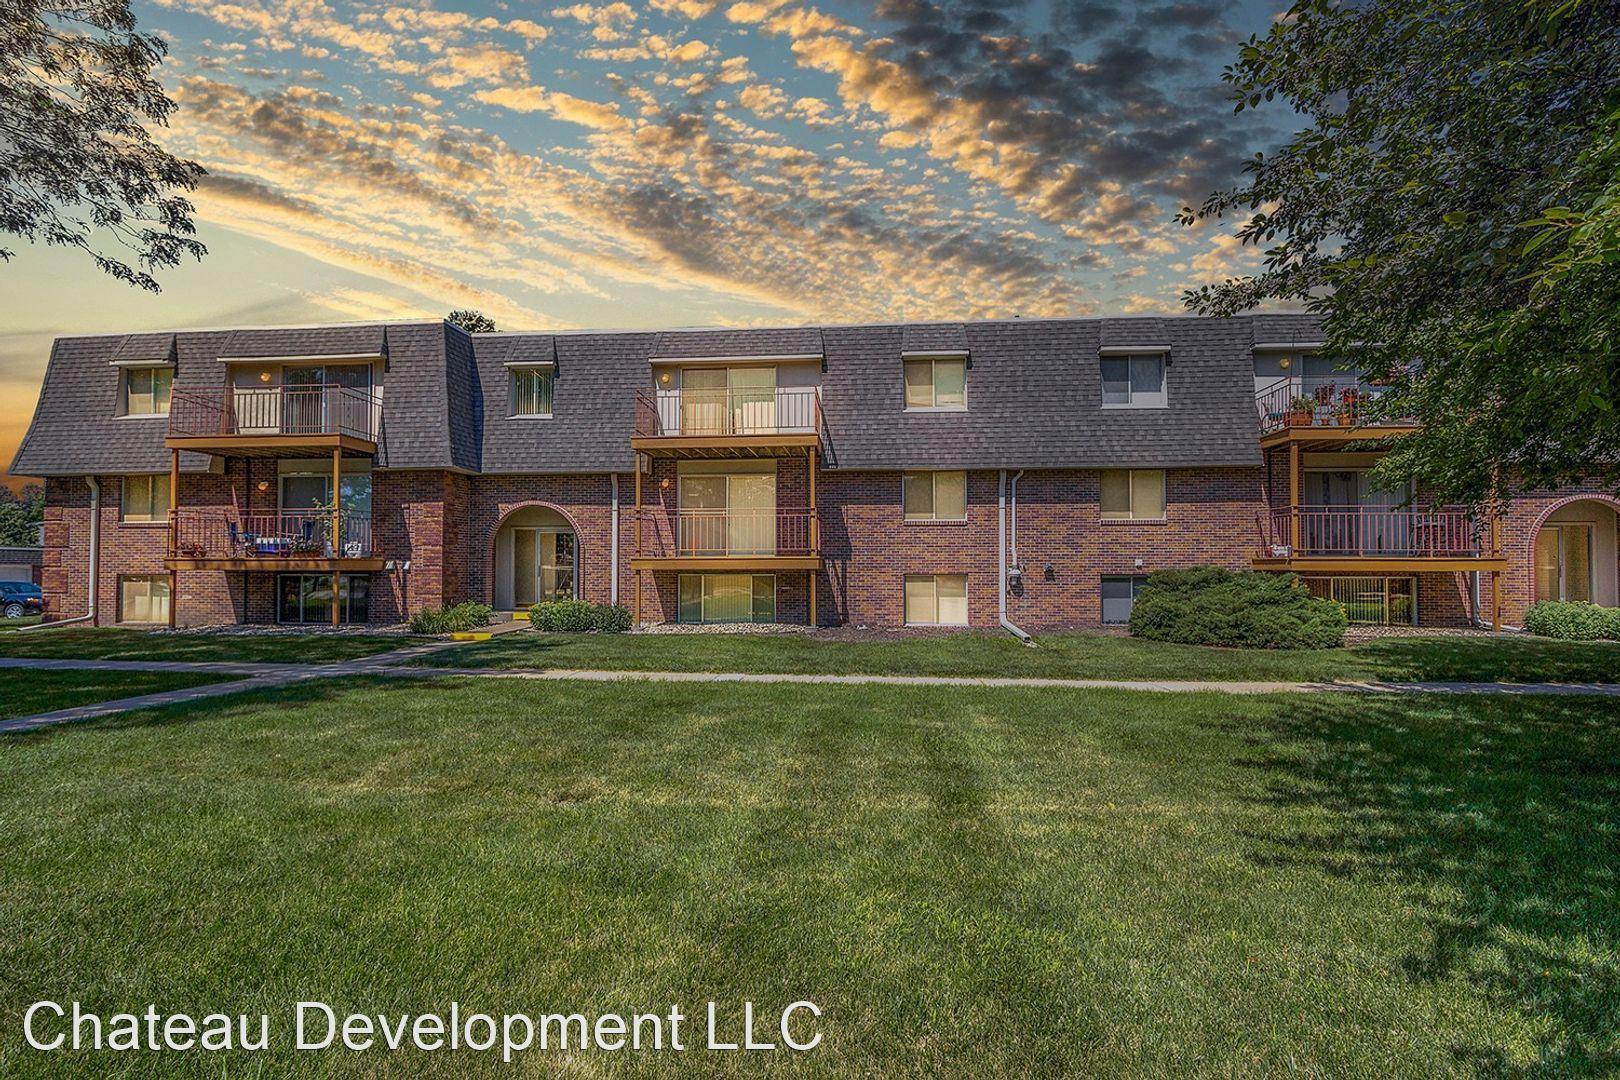 Apartments Near Nebraska Chateau LaFleur for Nebraska Wesleyan University Students in Lincoln, NE